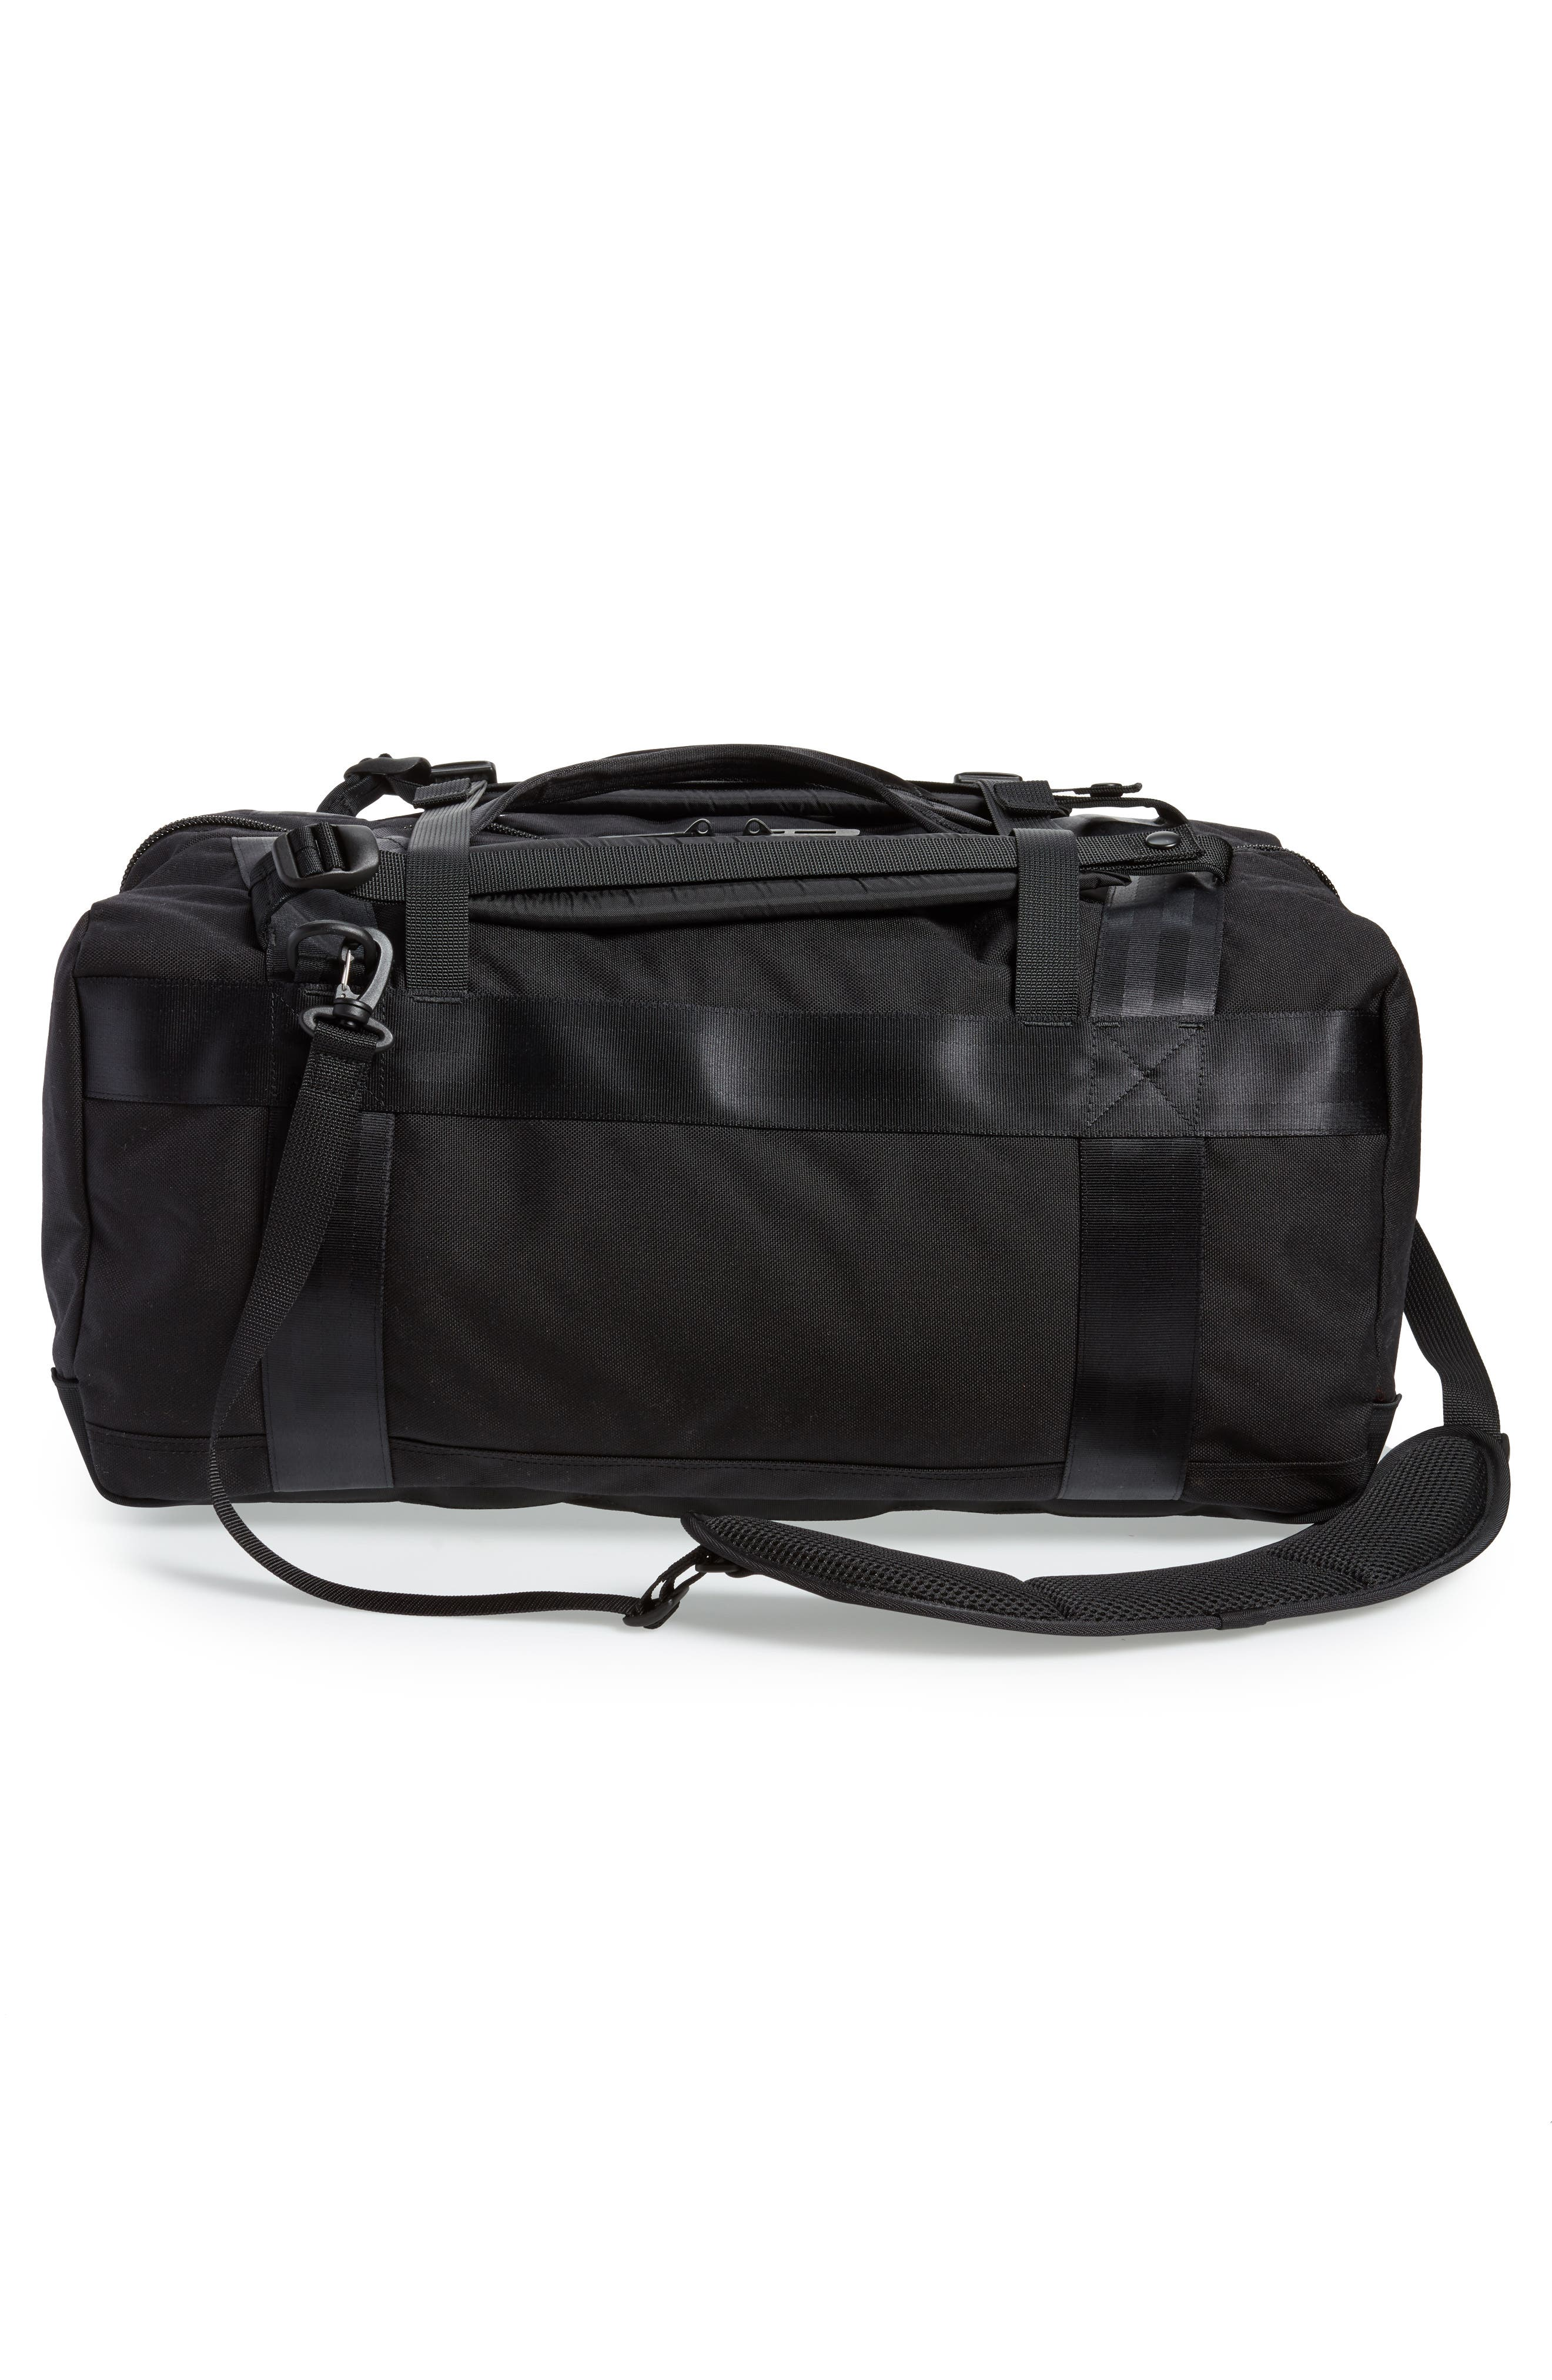 Porter-Yoshida & Co. Boothpack Convertible Duffel Bag,                             Alternate thumbnail 4, color,                             001